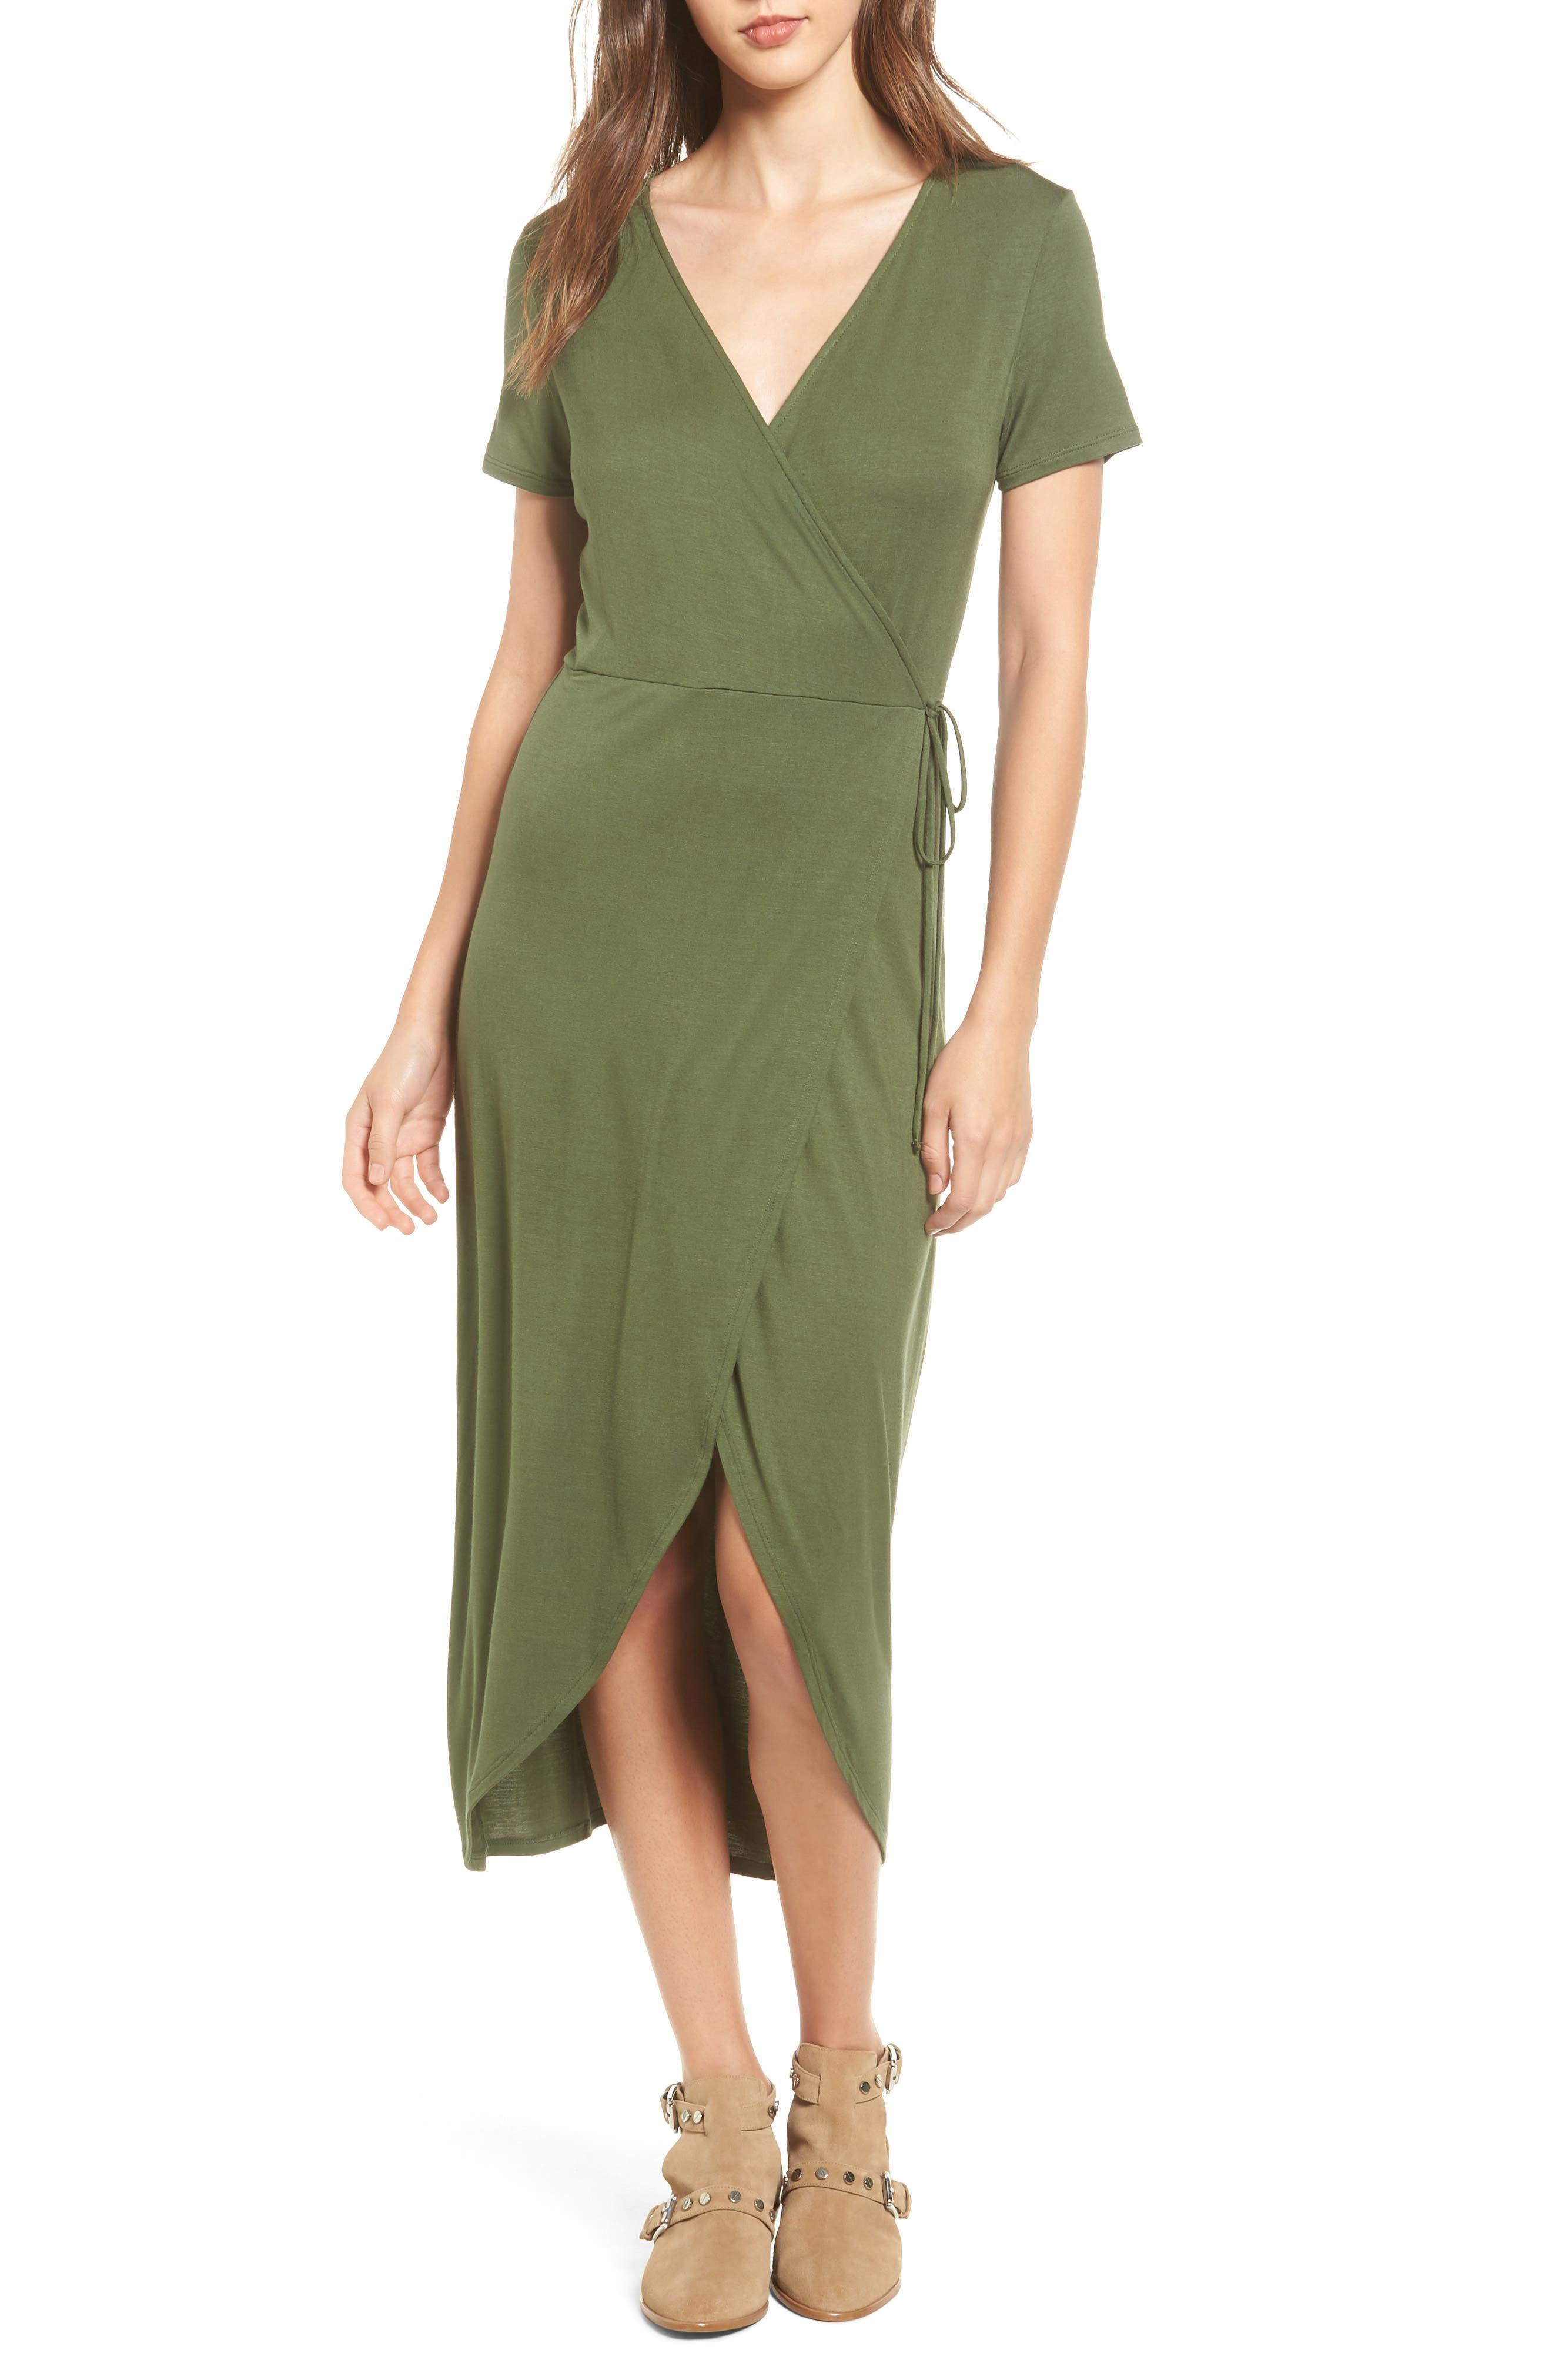 One Clothing Knit Wrap Midi Dress